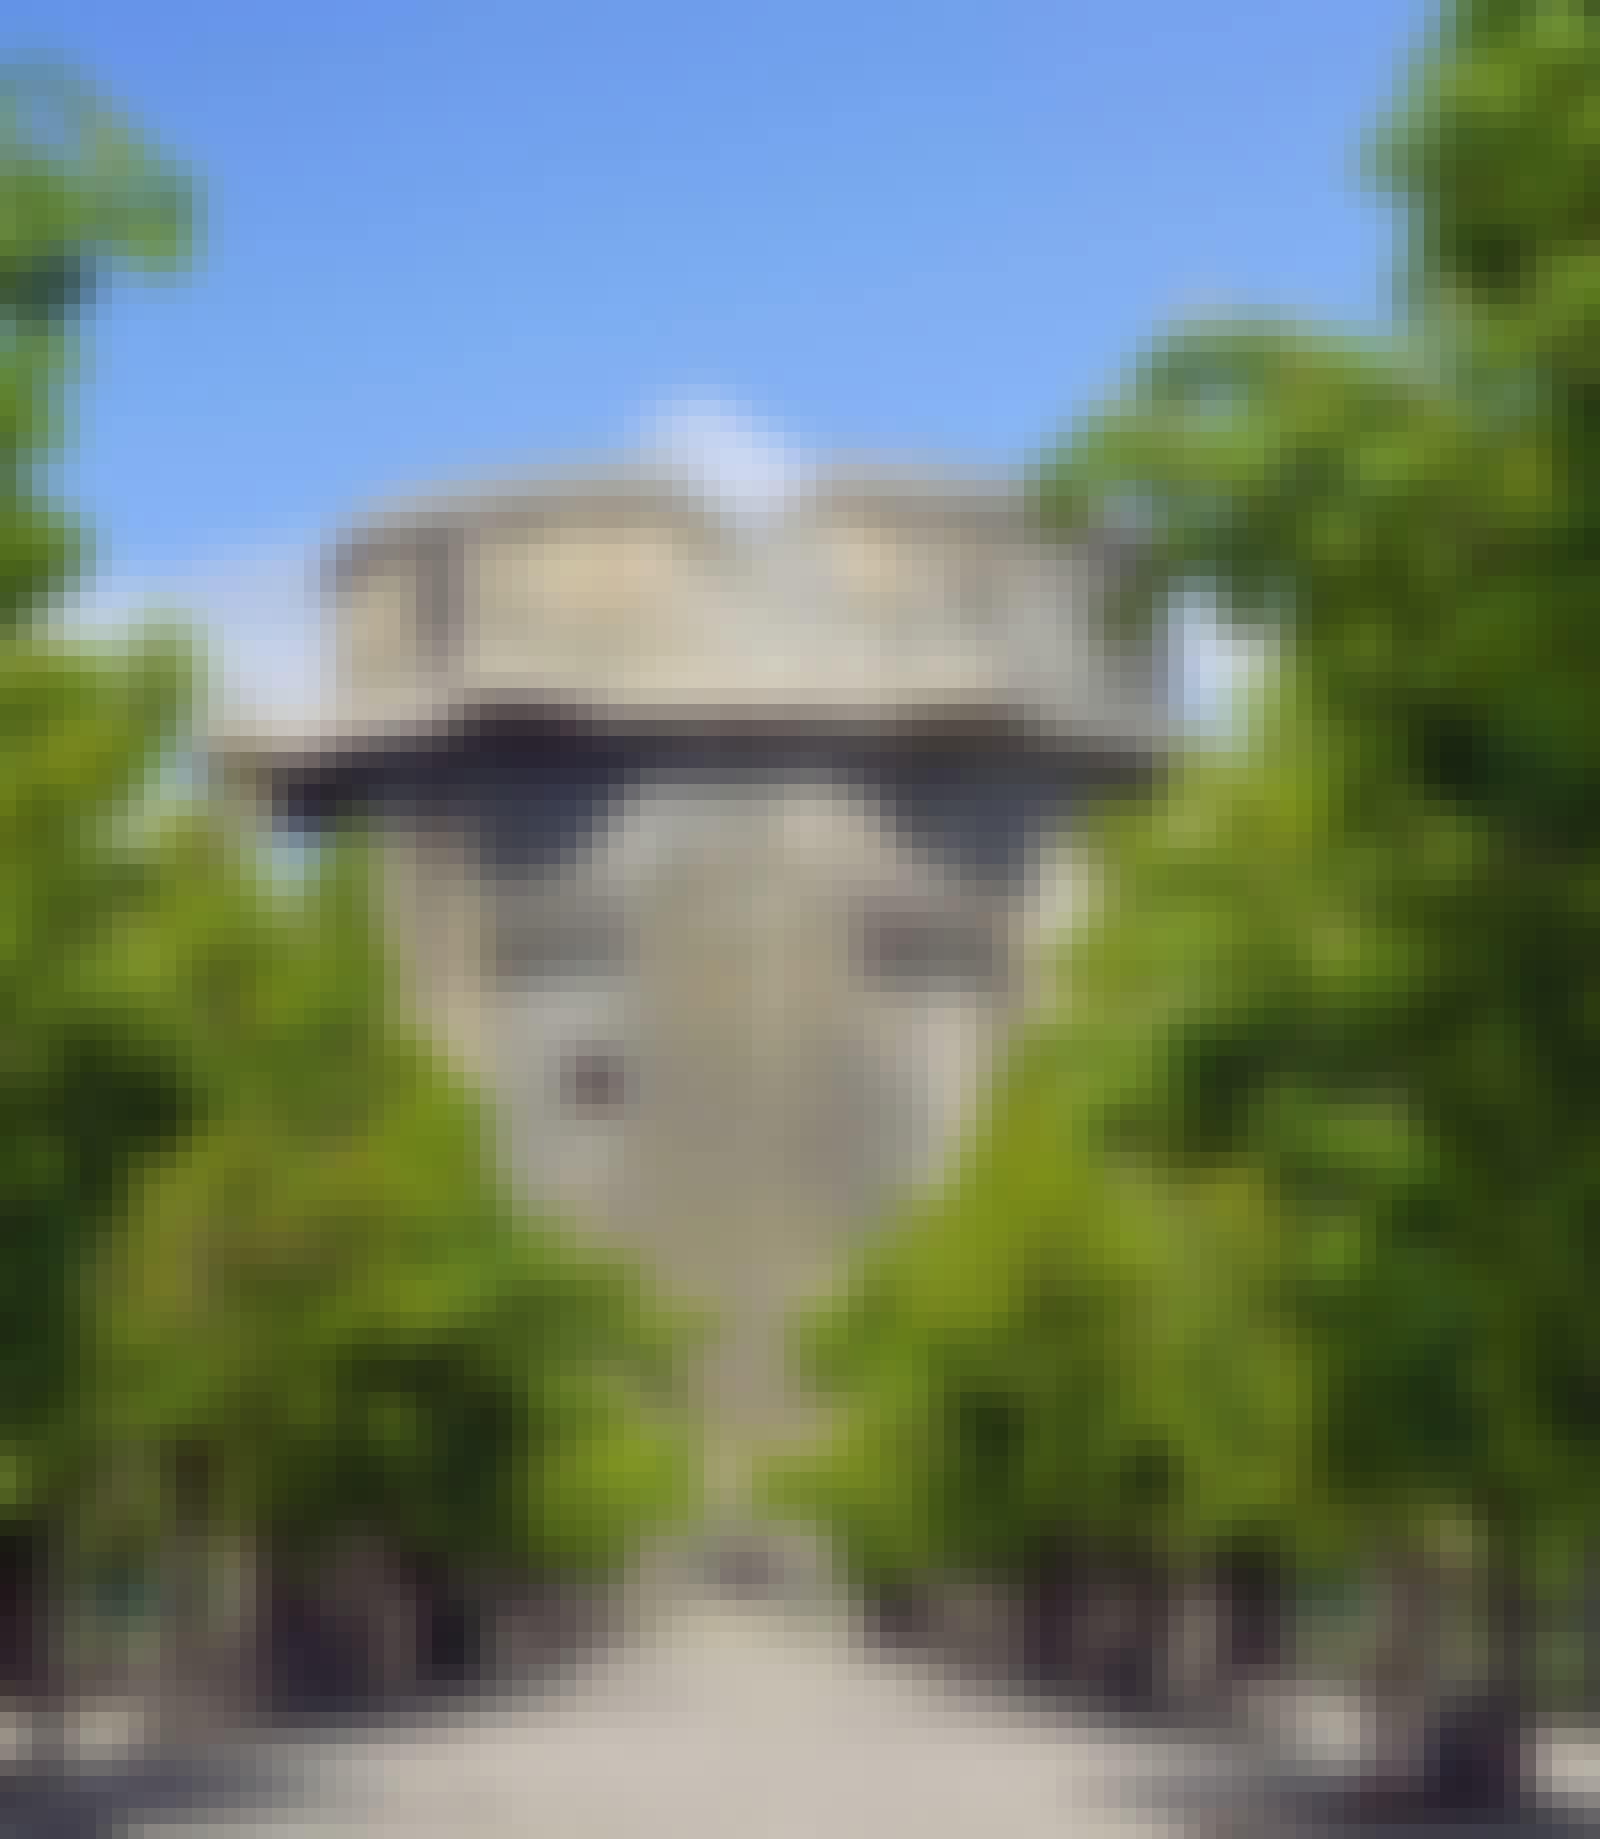 It-torni Wienissä